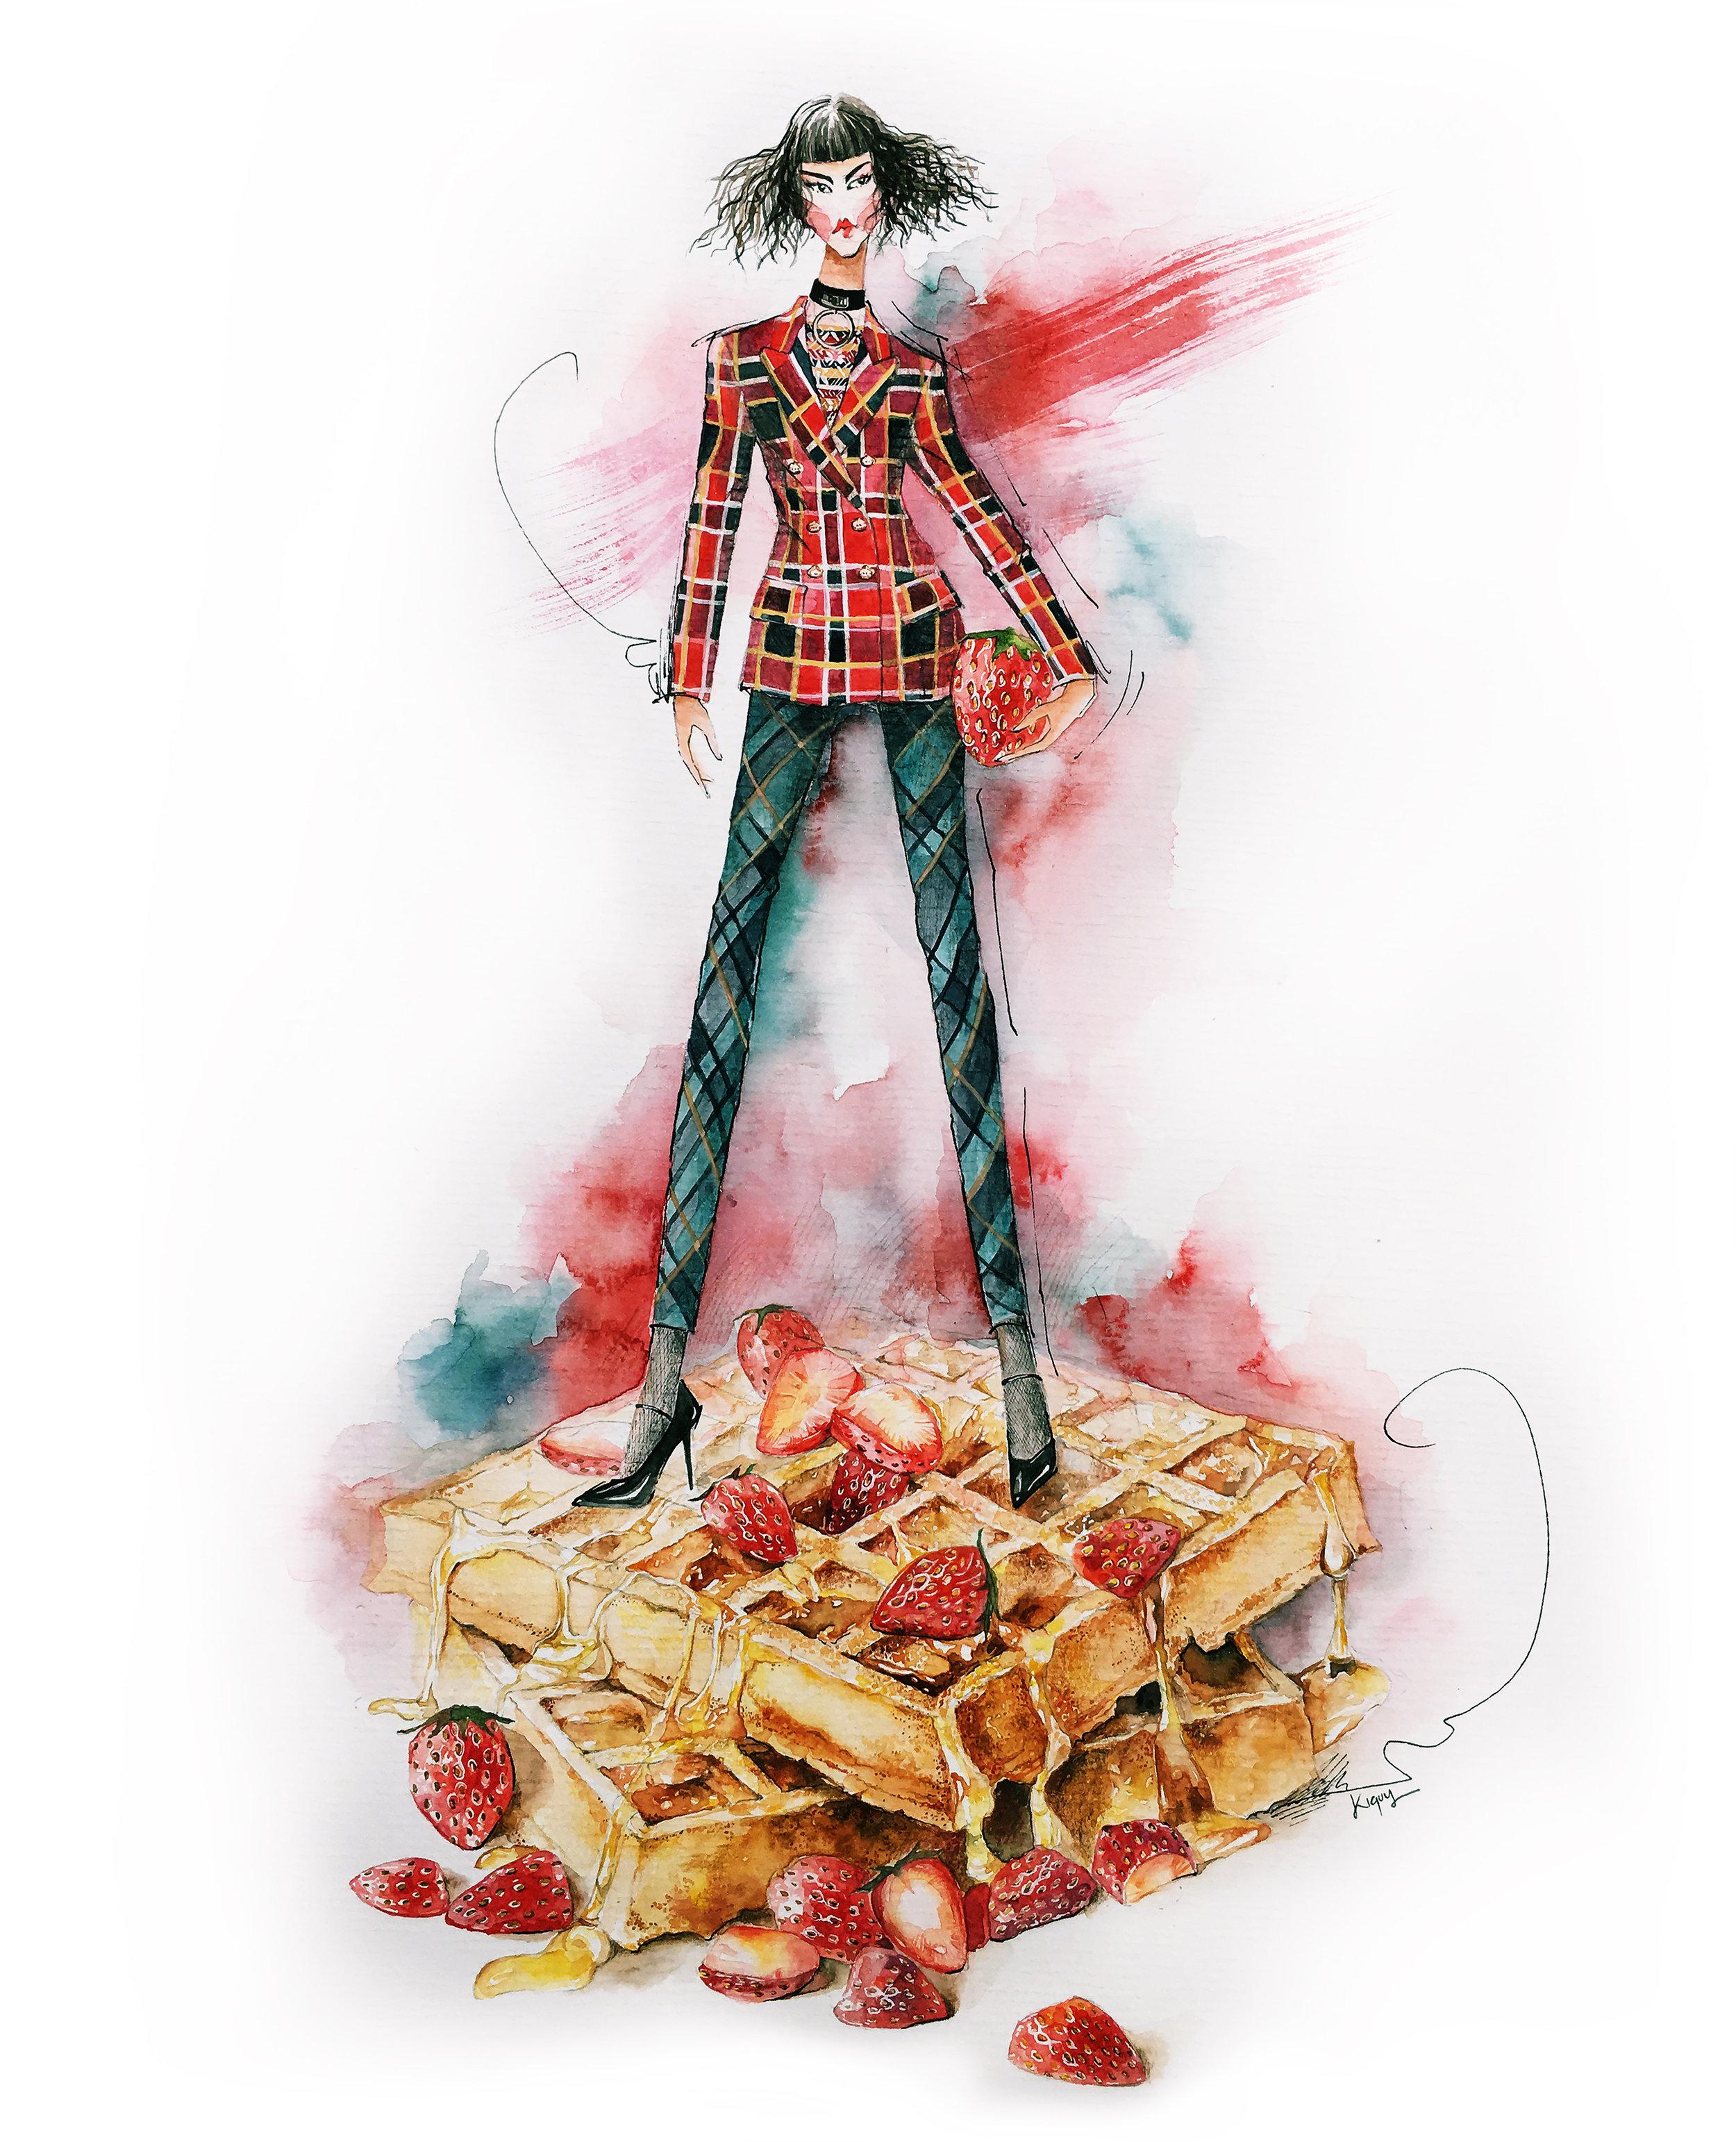 wafflemodel.jpg